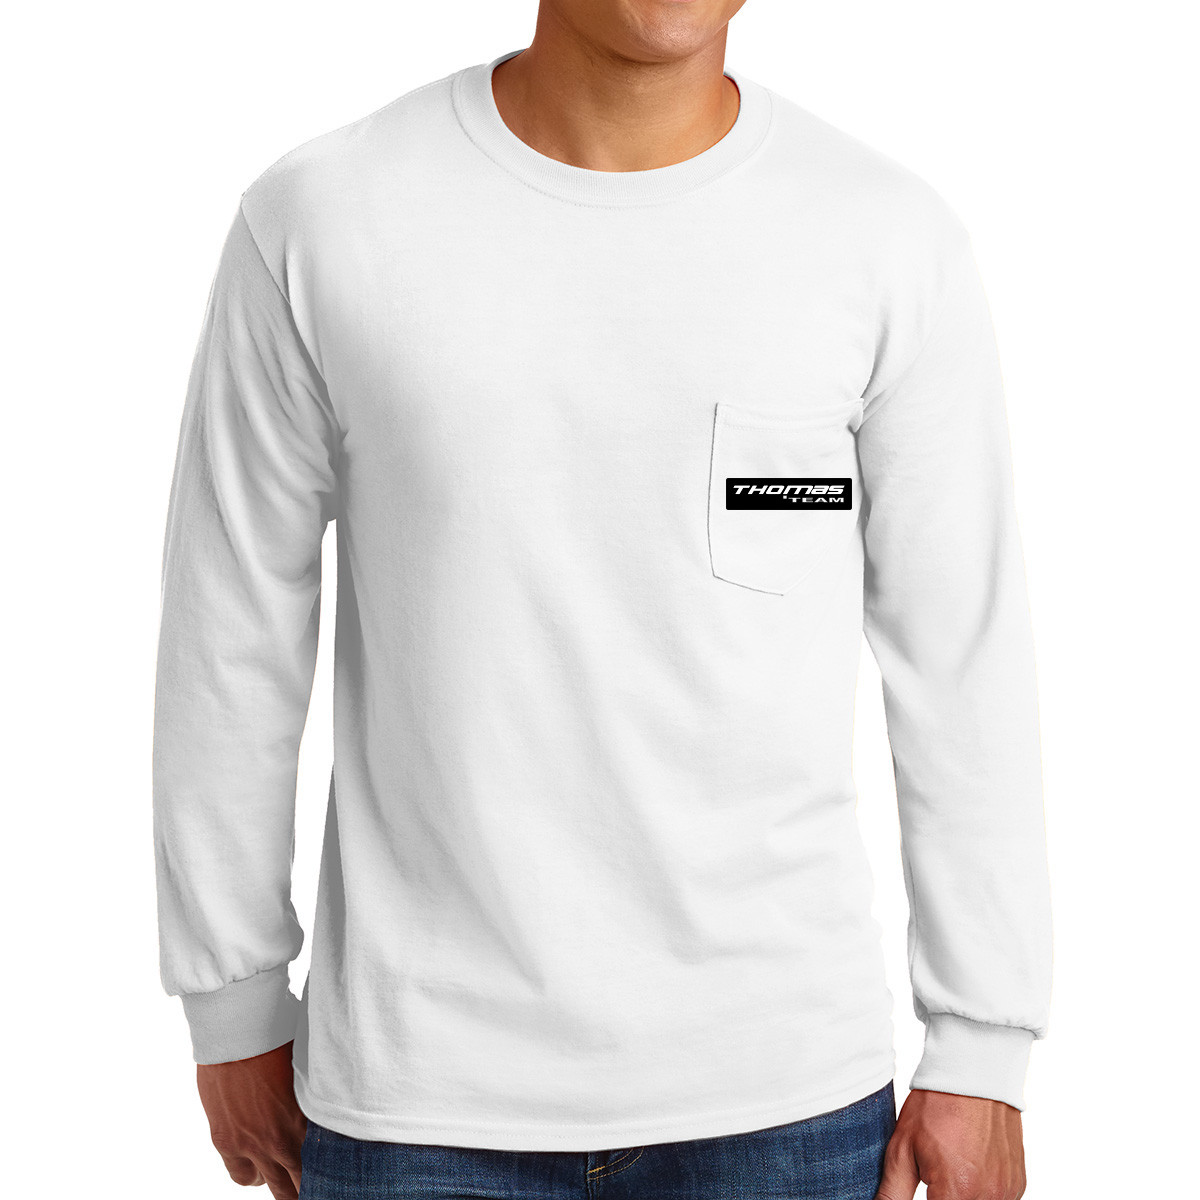 Gildan ® Ultra Cotton ® 100% Cotton Long Sleeve T-Shirt with Pocket